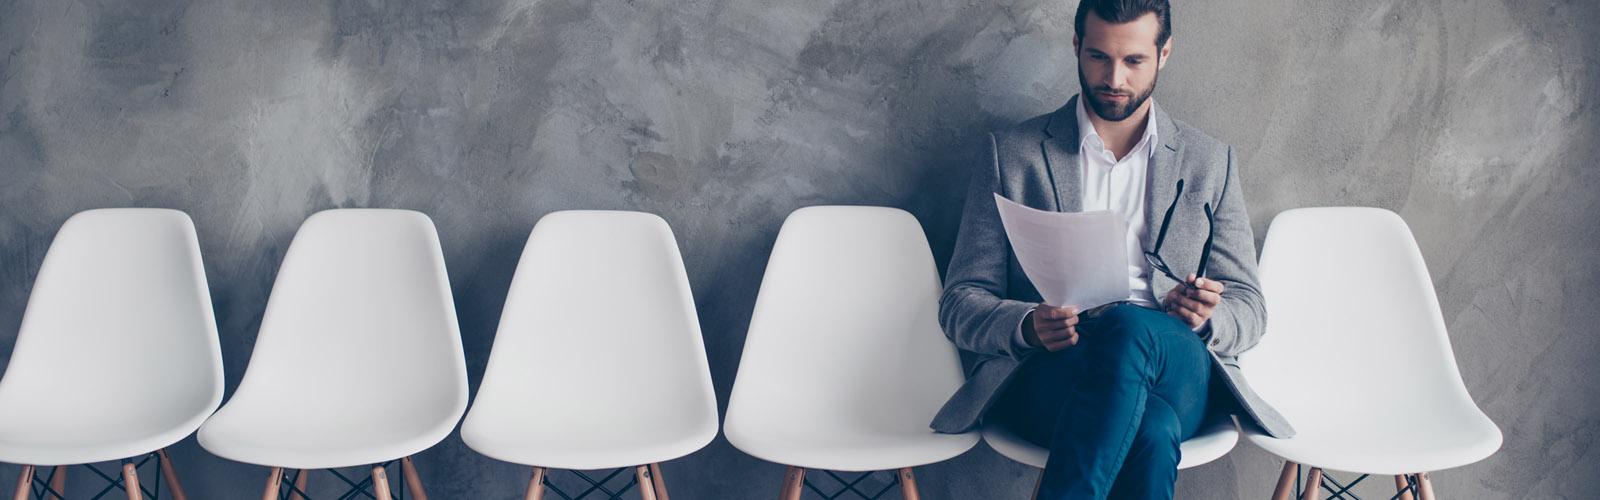 Social Media Recruiting - Personalrekrutierung in Sozialen Medien